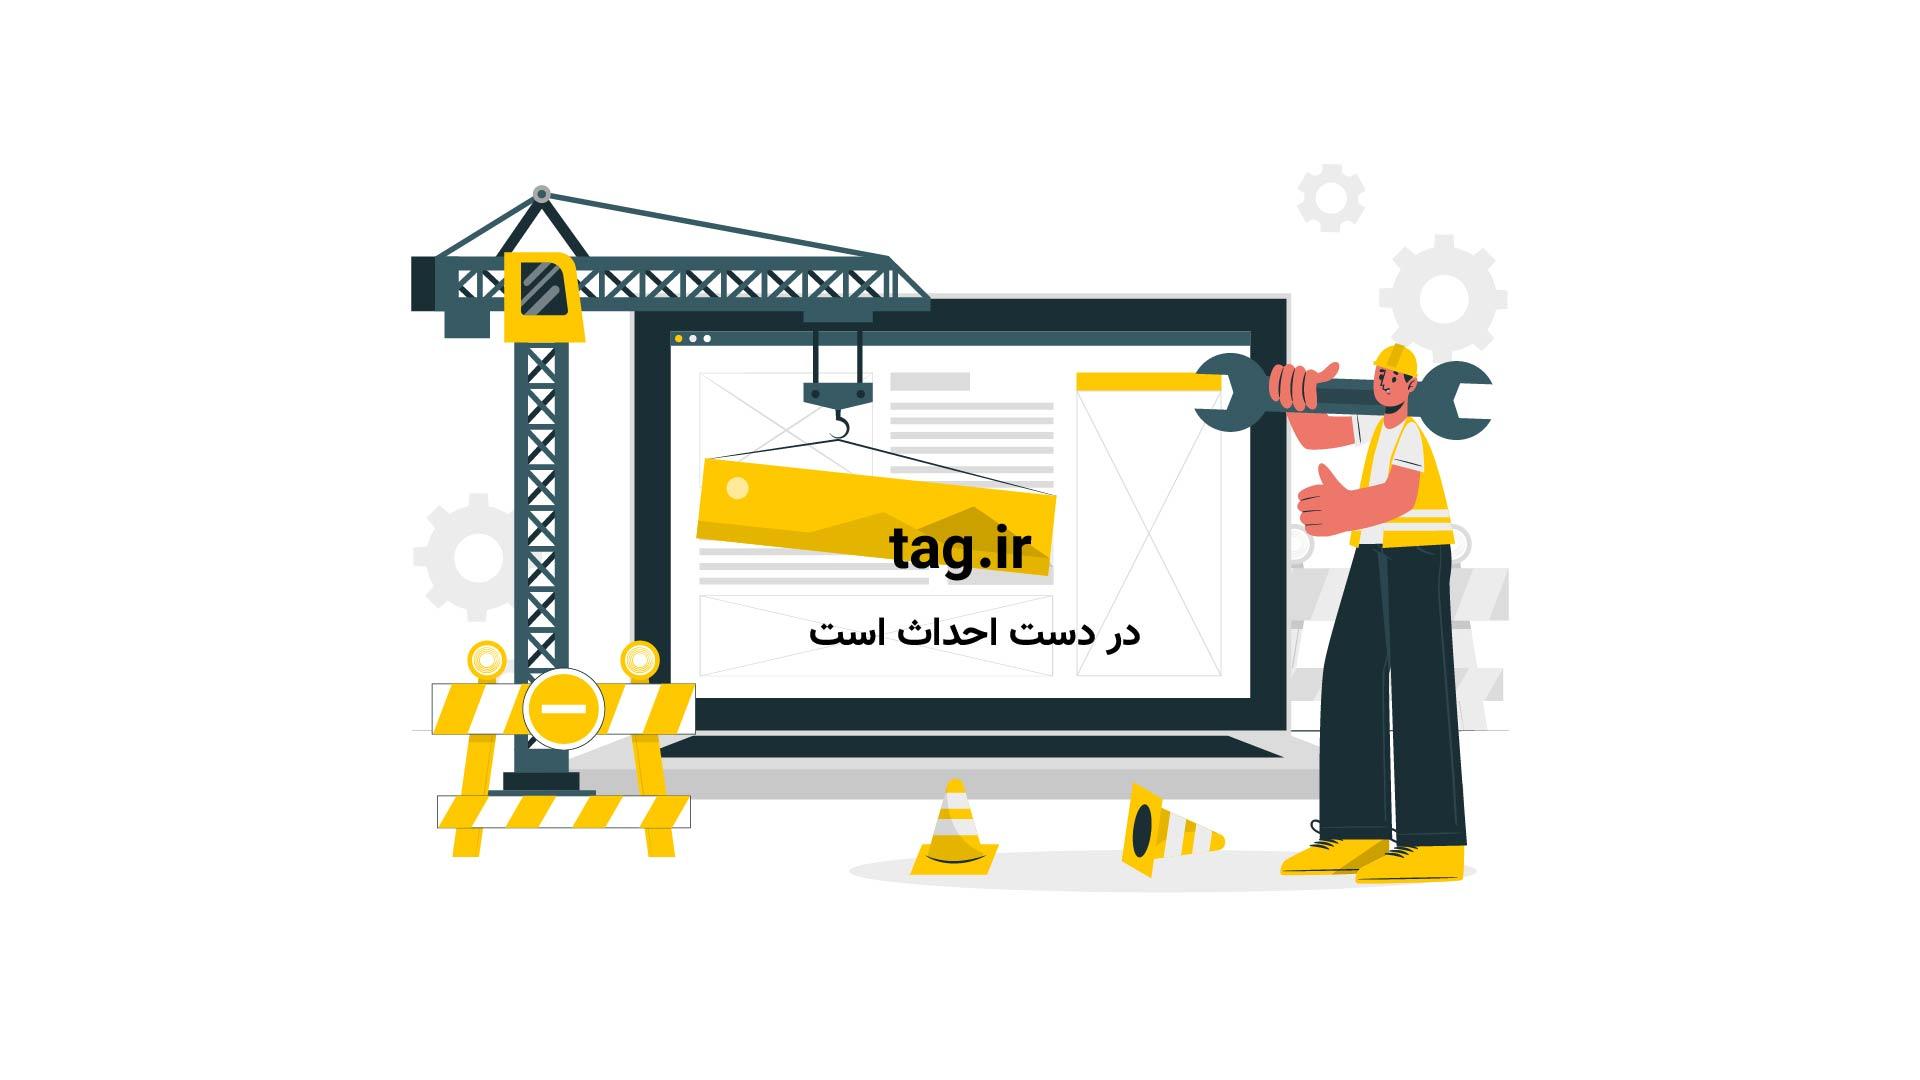 اشک سگ